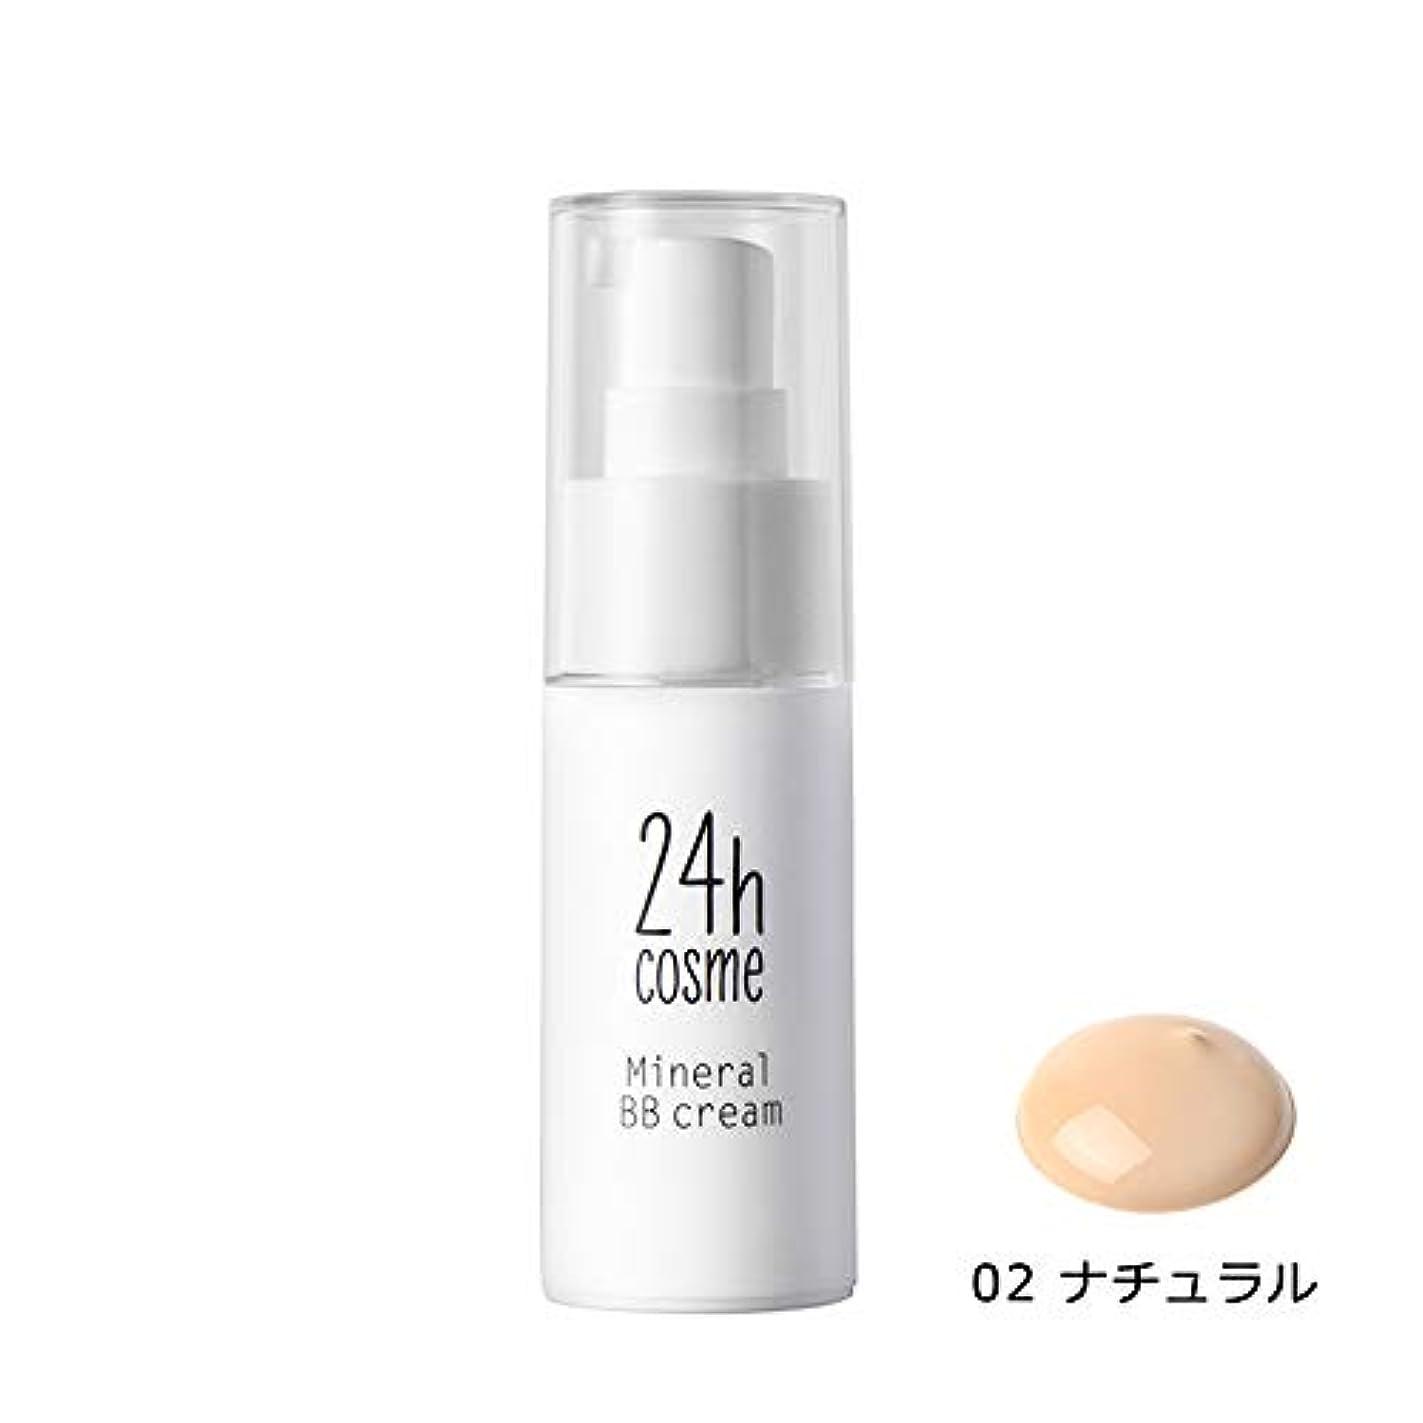 24h cosme 24 ミネラルBBクリーム 02 ナチュラル SPF30PA+++